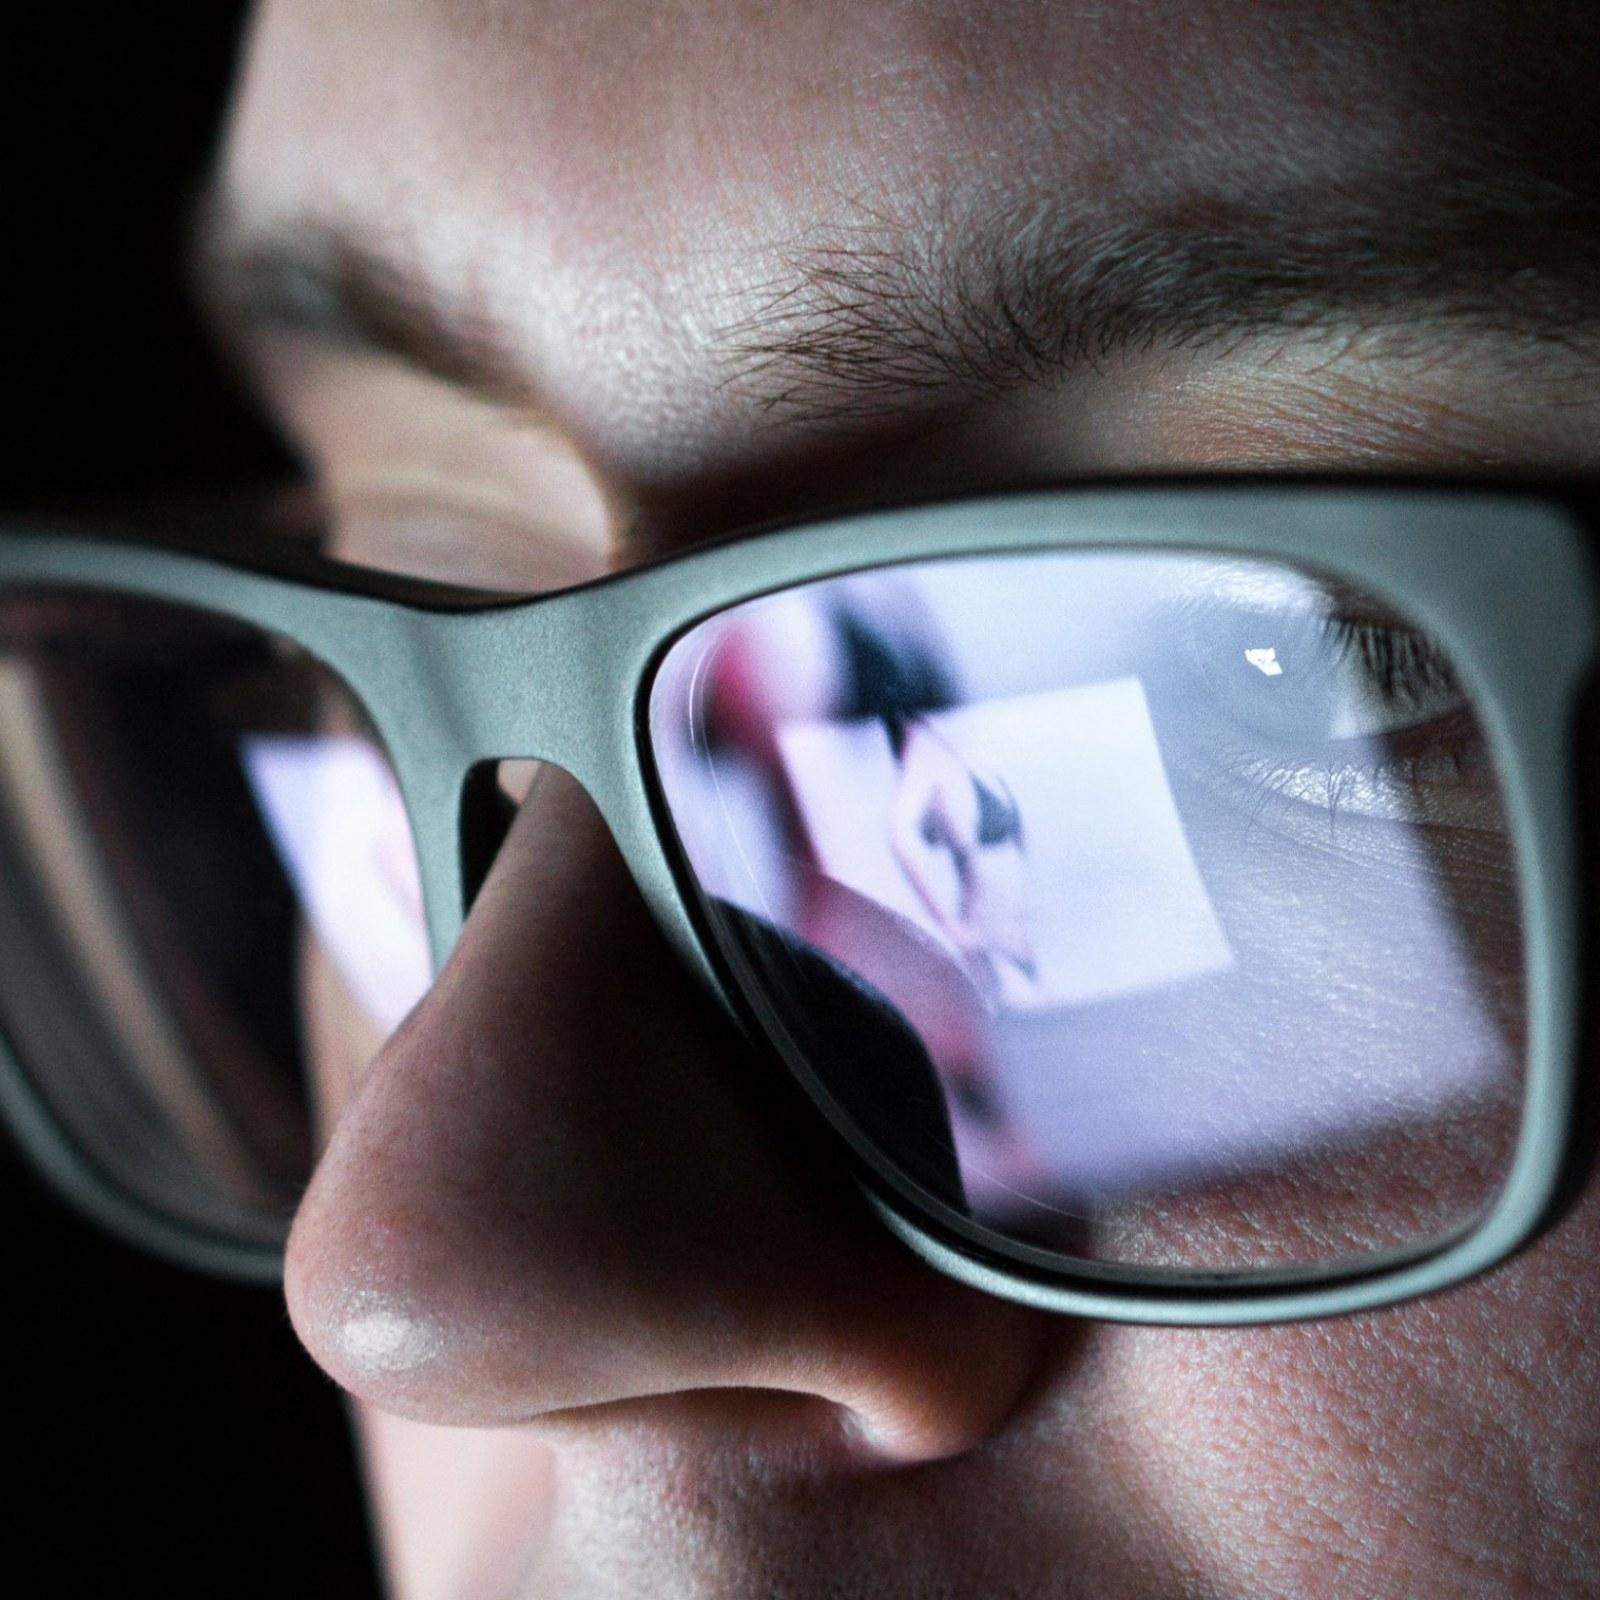 3D Porn No Glasses what happened to new york's revenge porn bill?